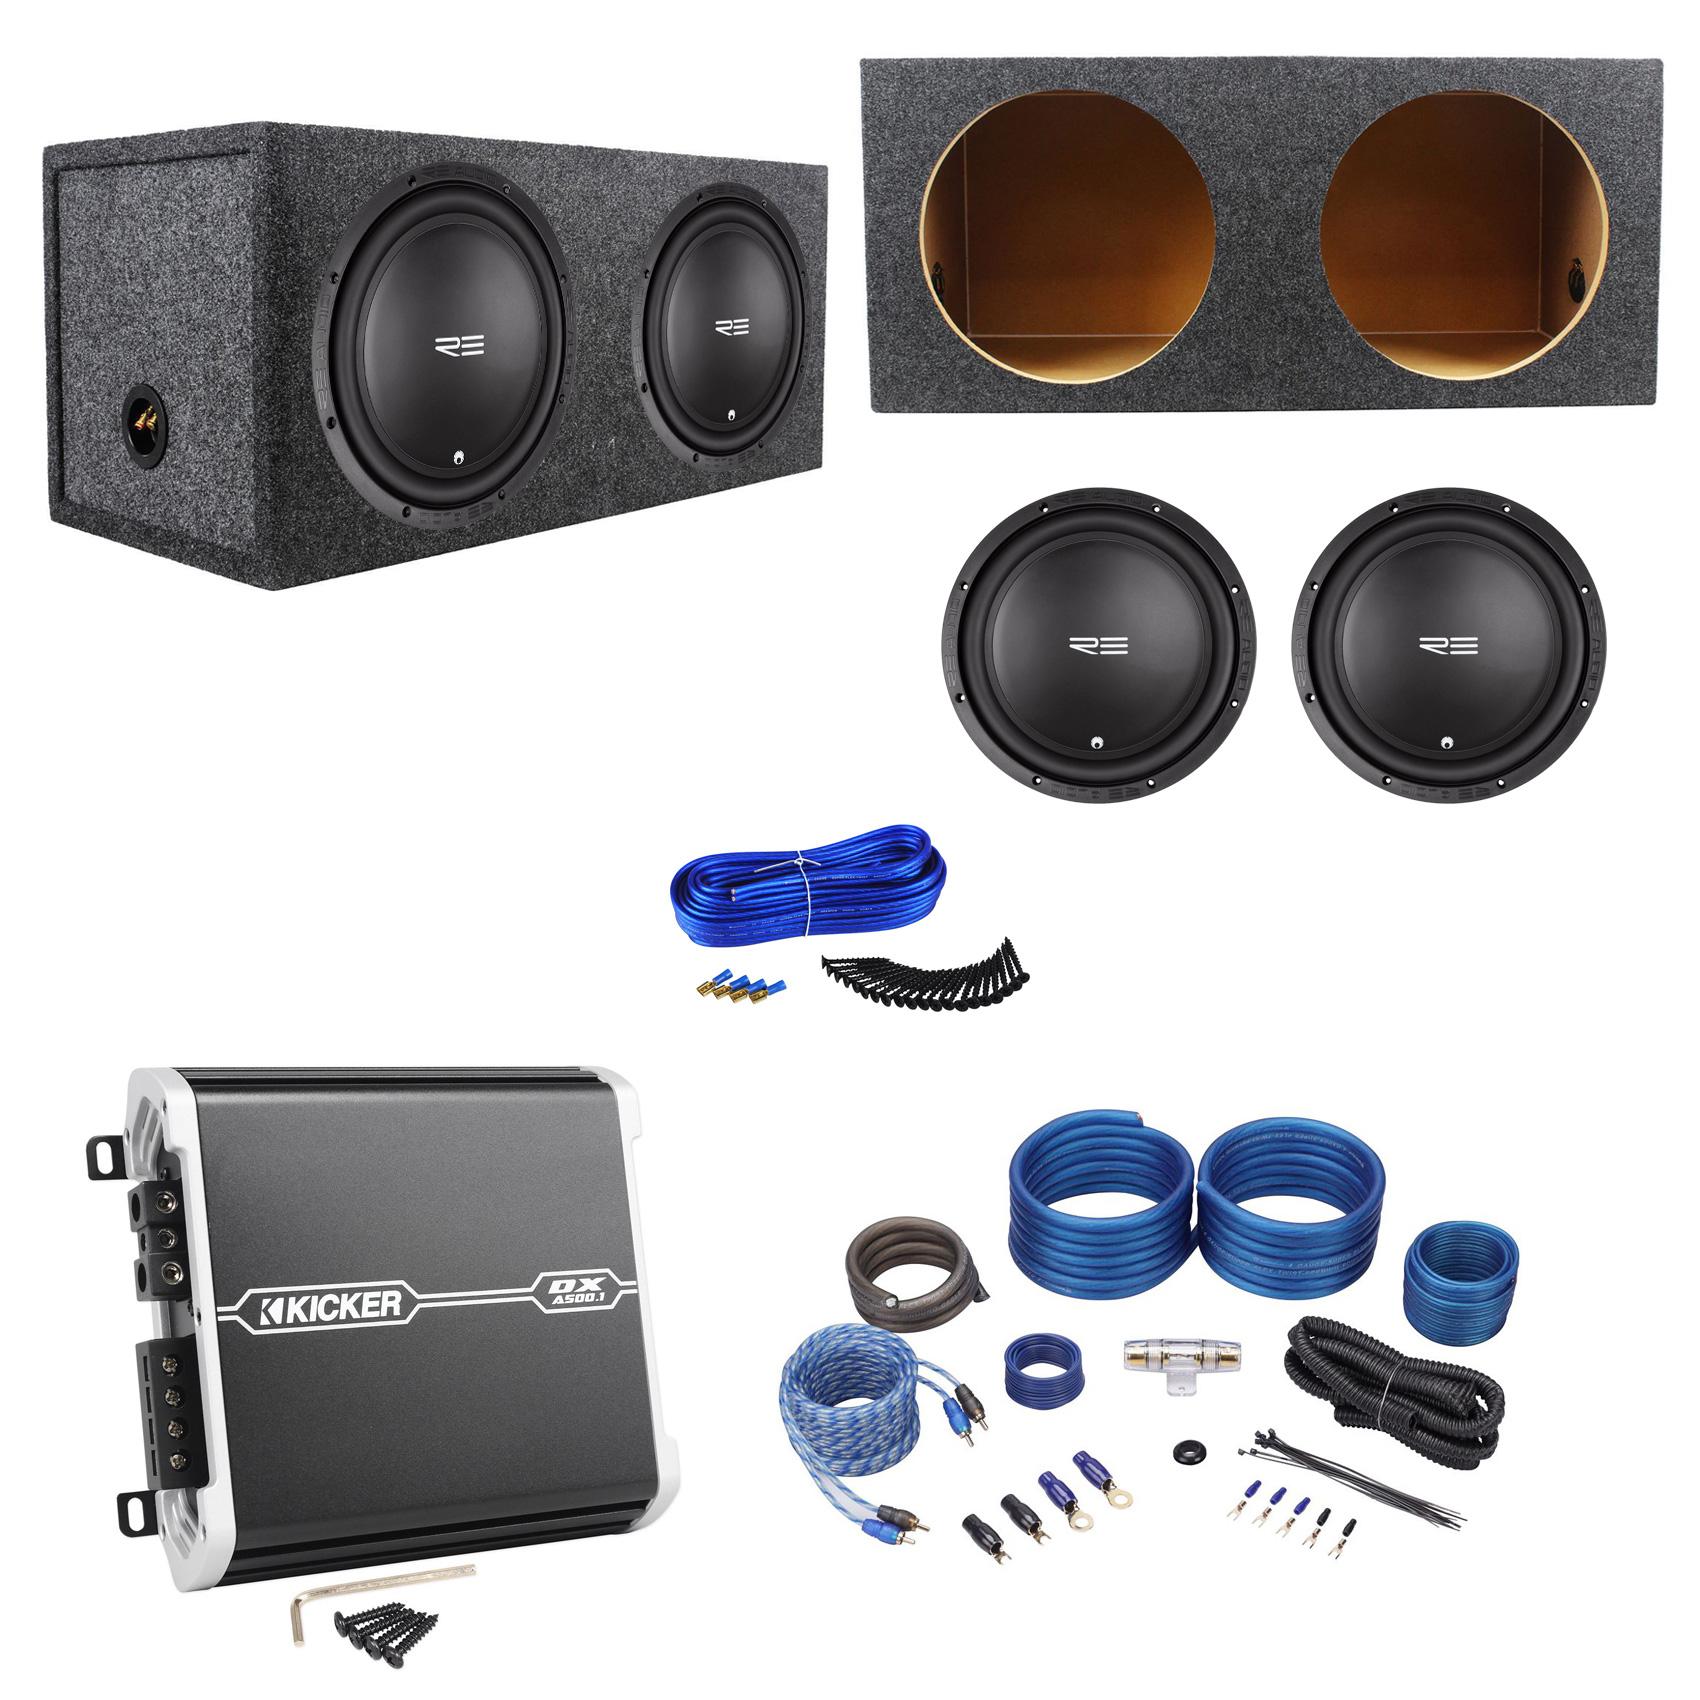 "2 RE Audio REX12S4 V2 12"" 400W Subwoofers+Sealed Box+Kicker Amplifier+Amp Kit"